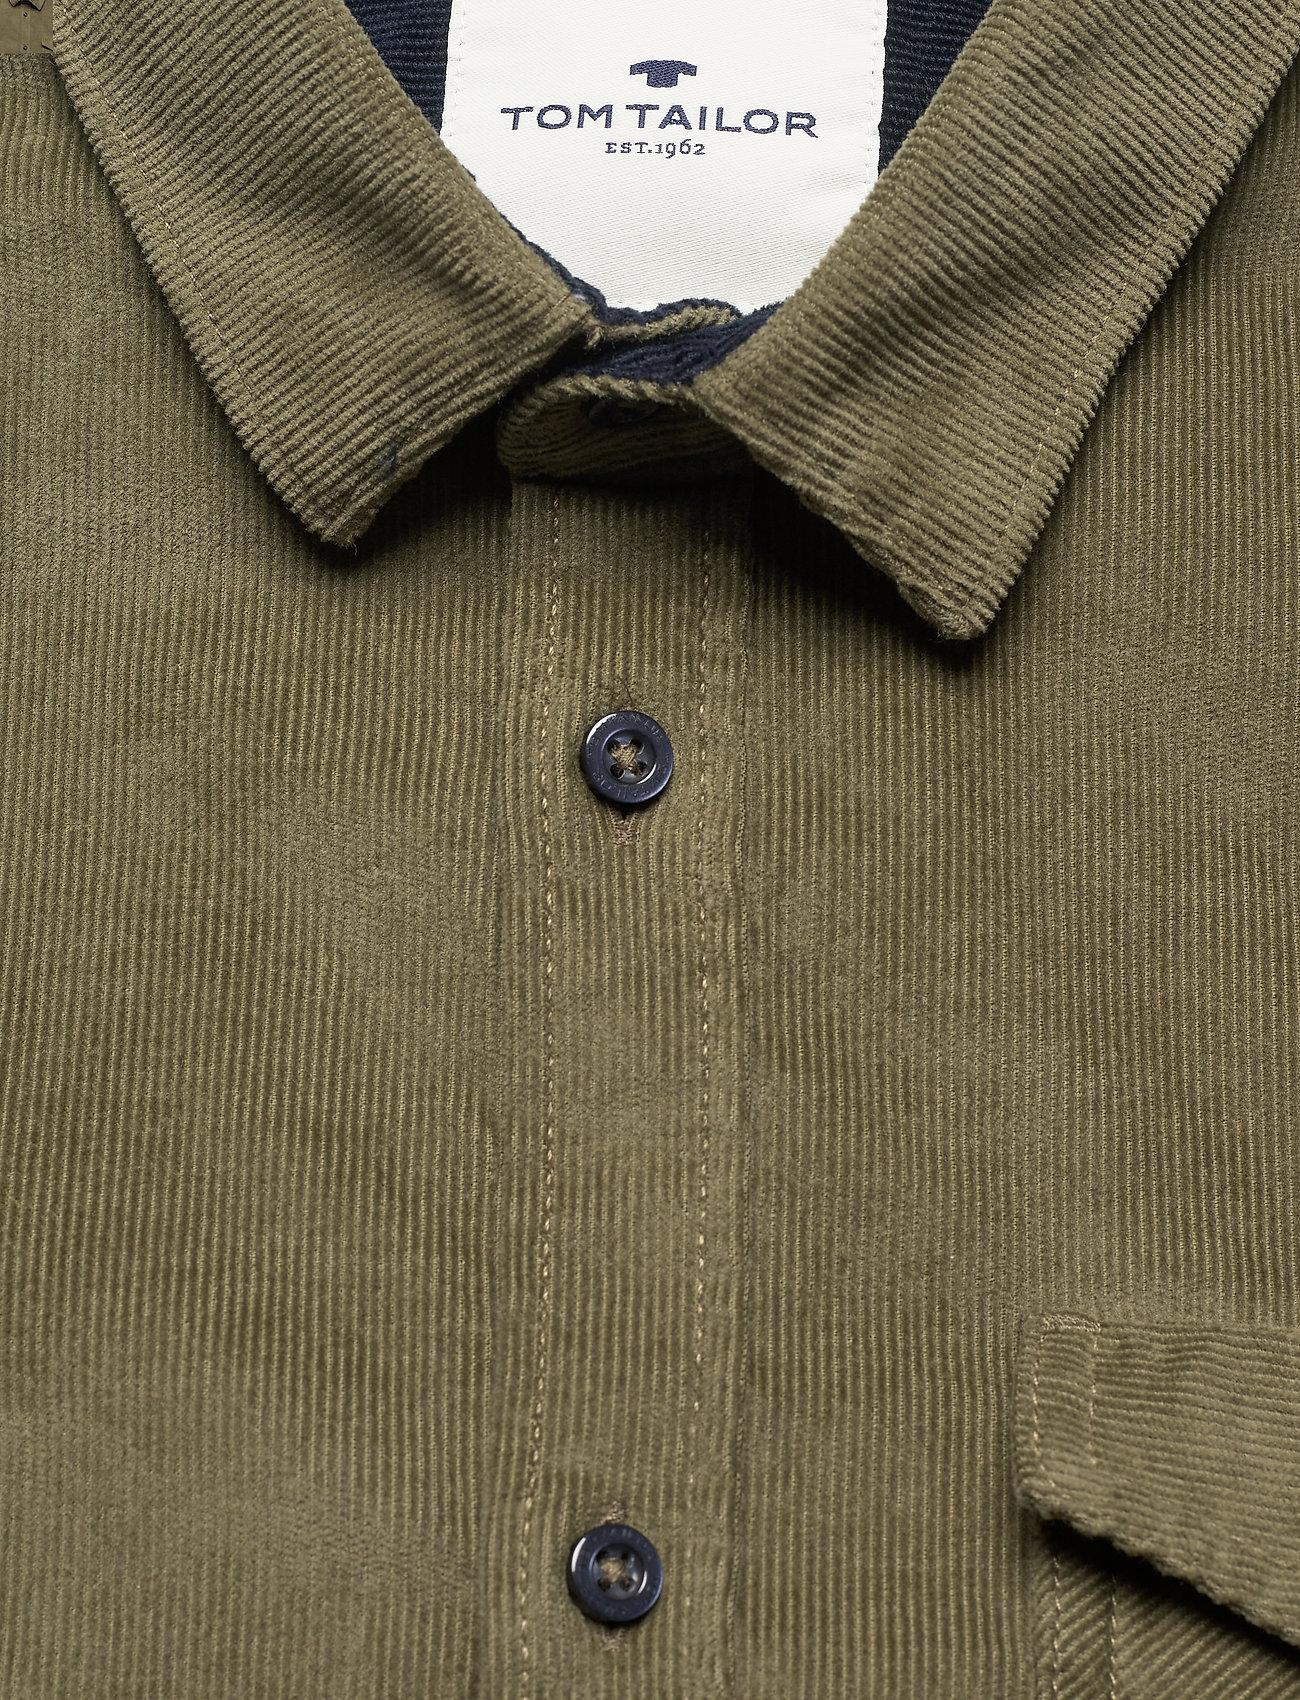 Tom Tailor regular casu - Skjorter OLIVE NIGHT GREEN - Menn Klær